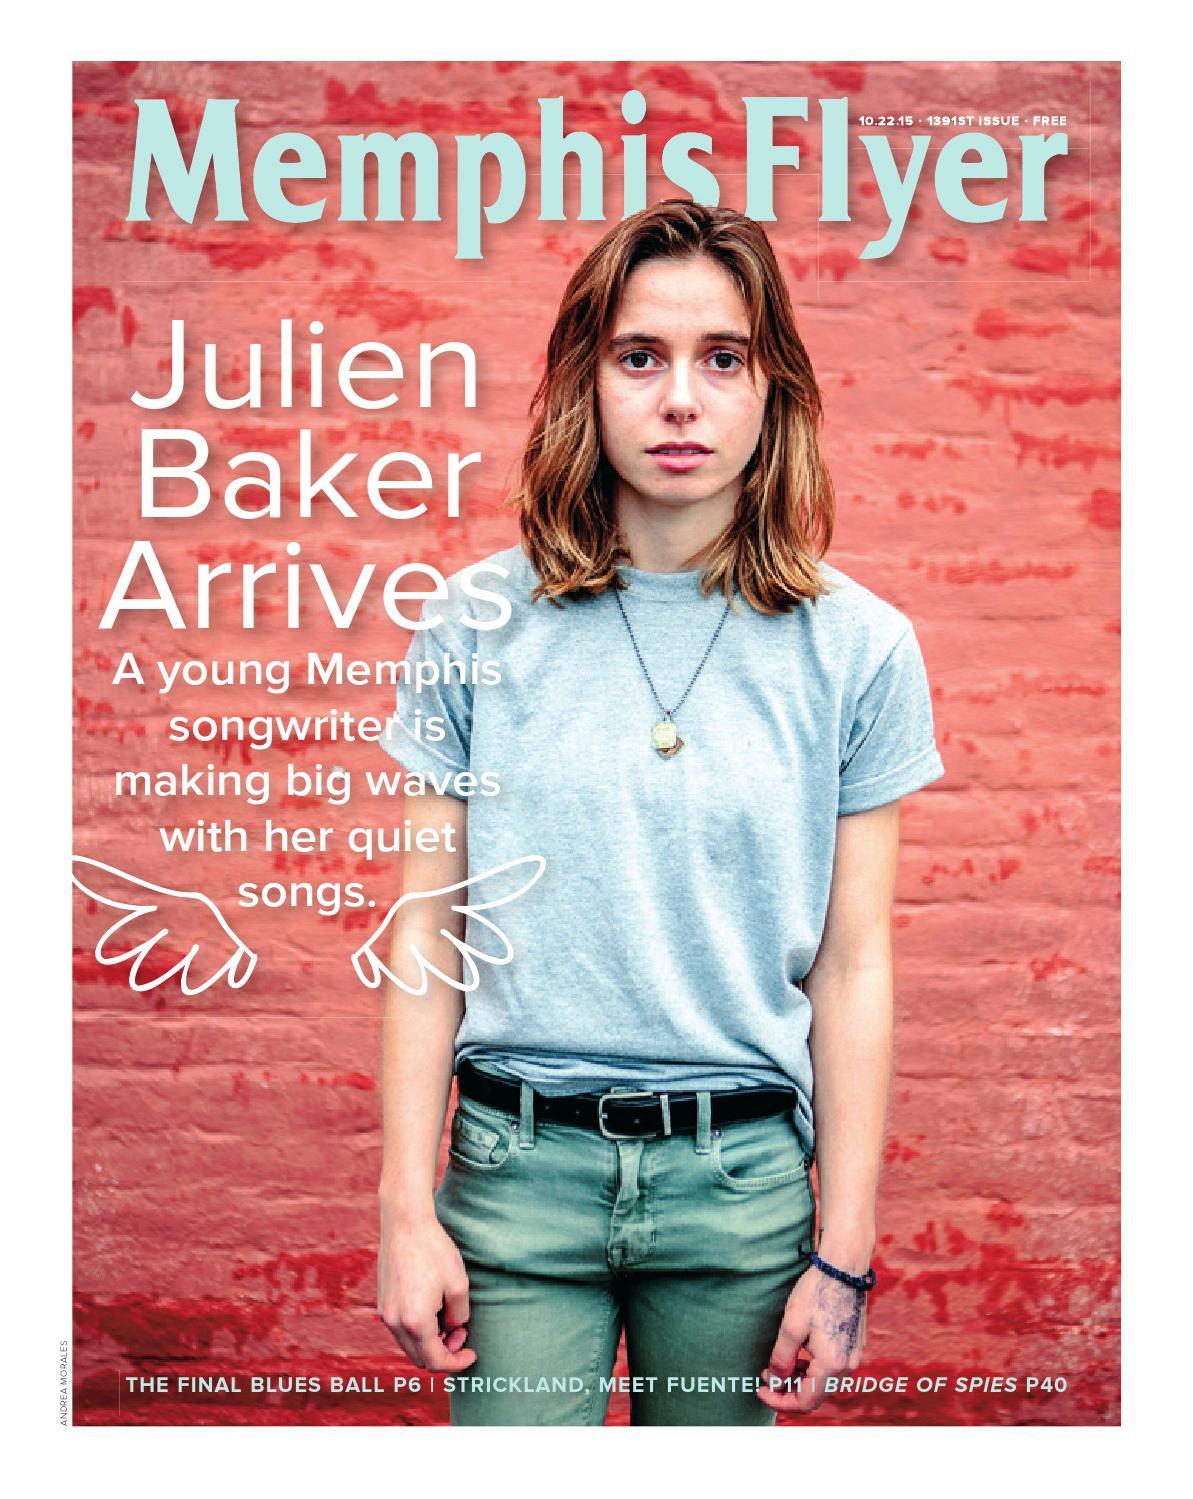 5b17db3c40 Memphis Flyer 10.22.15 by Contemporary Media - issuu